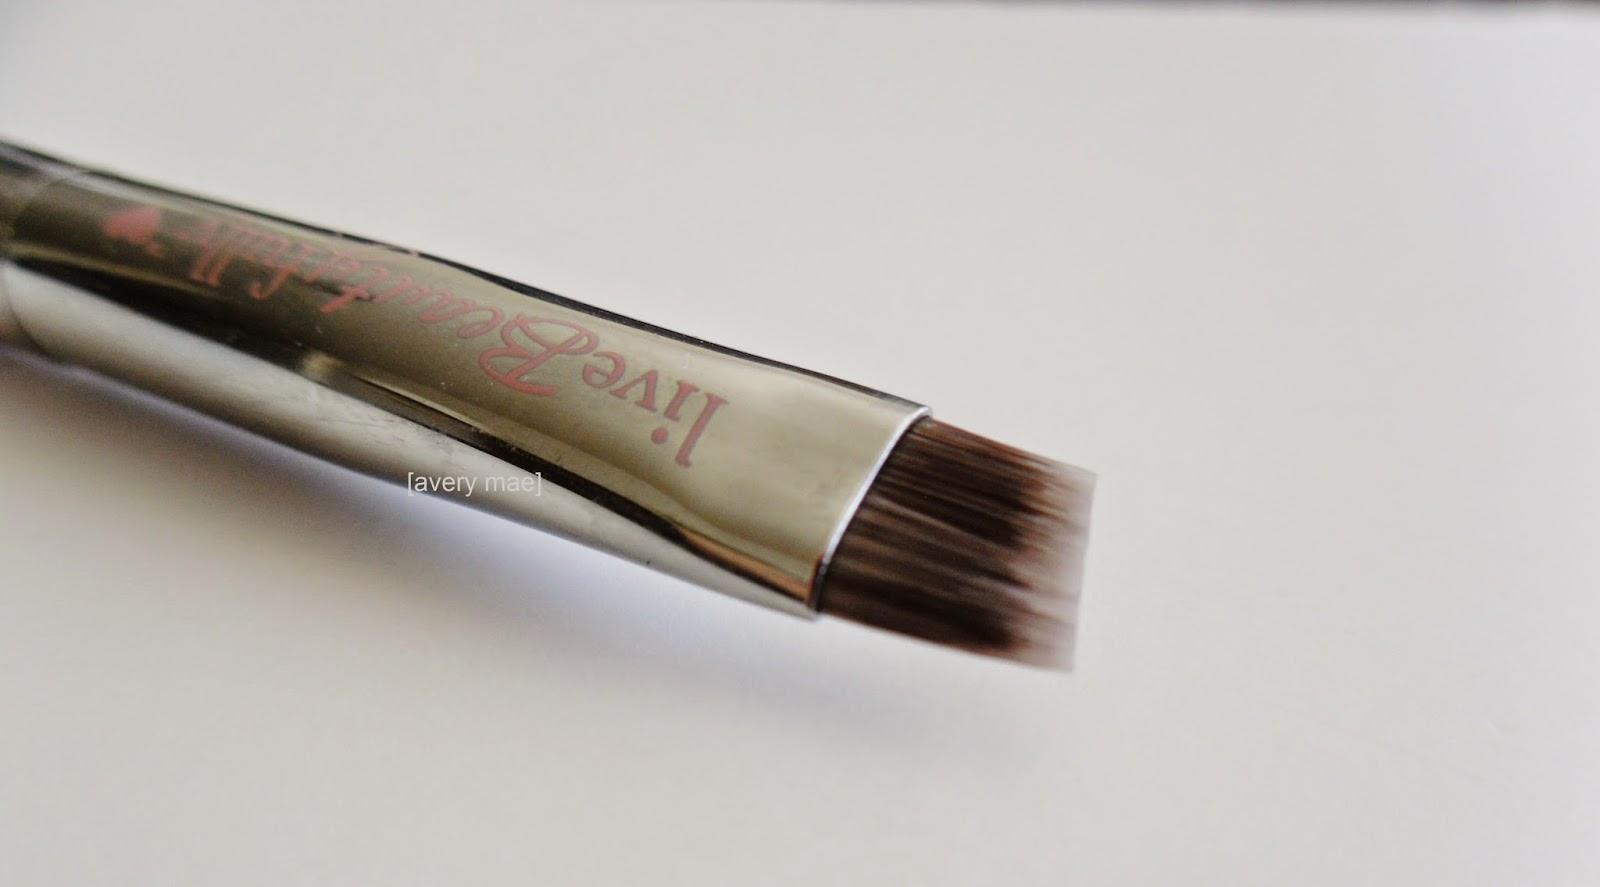 It Cosmetics x ULTA Love Beauty Fully Angled Liner/Brow Brush #217 by IT Cosmetics #16